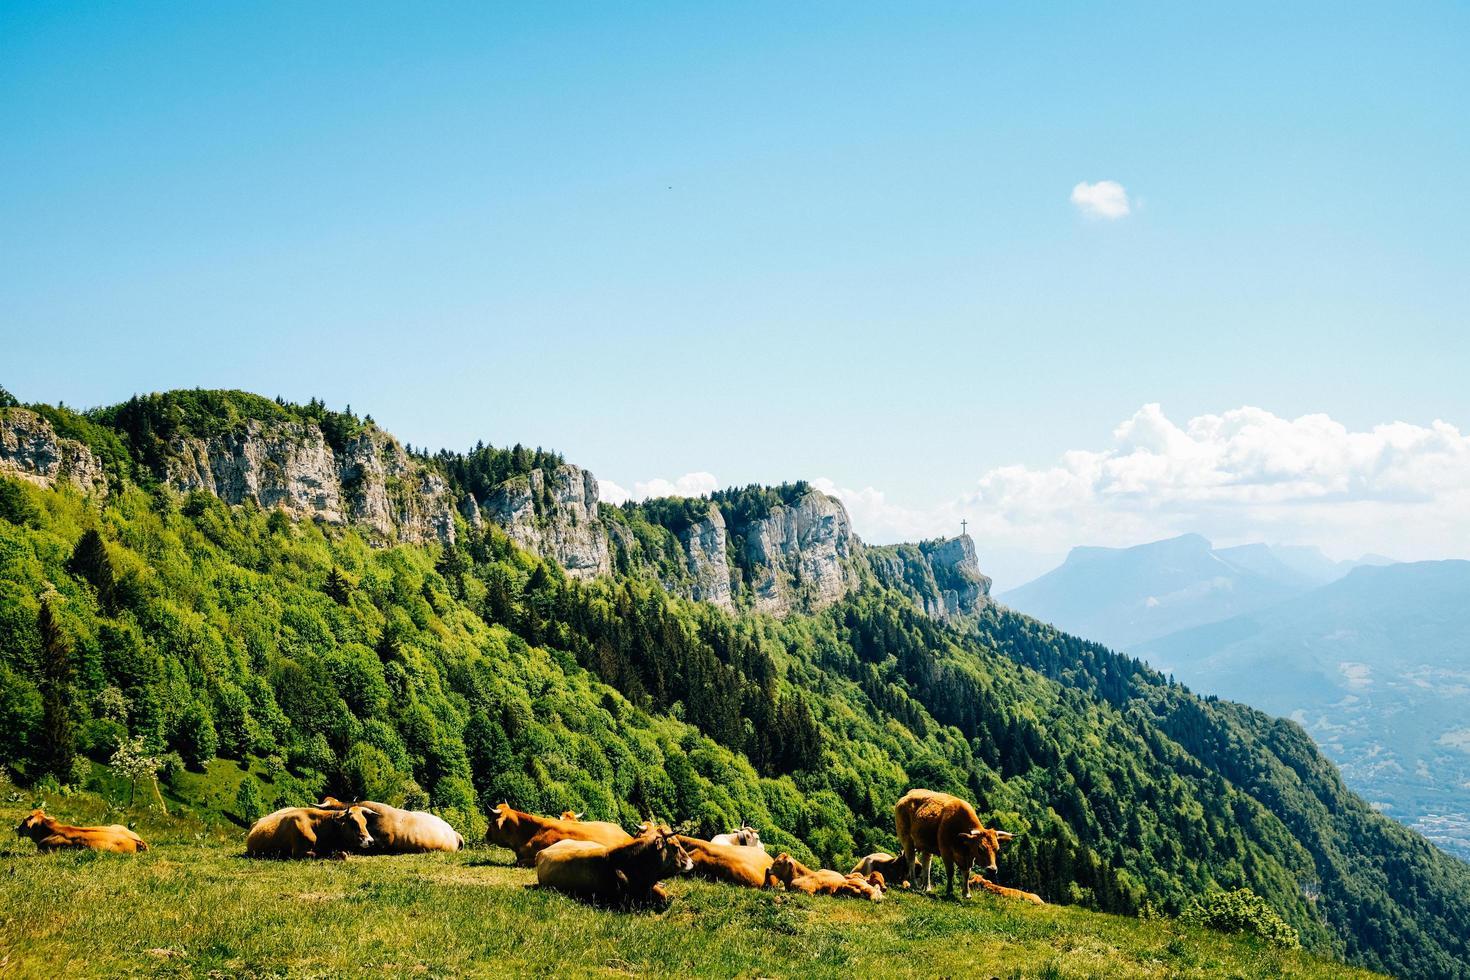 Vieh auf Grasfeld nahe Berg unter blauem Himmel foto